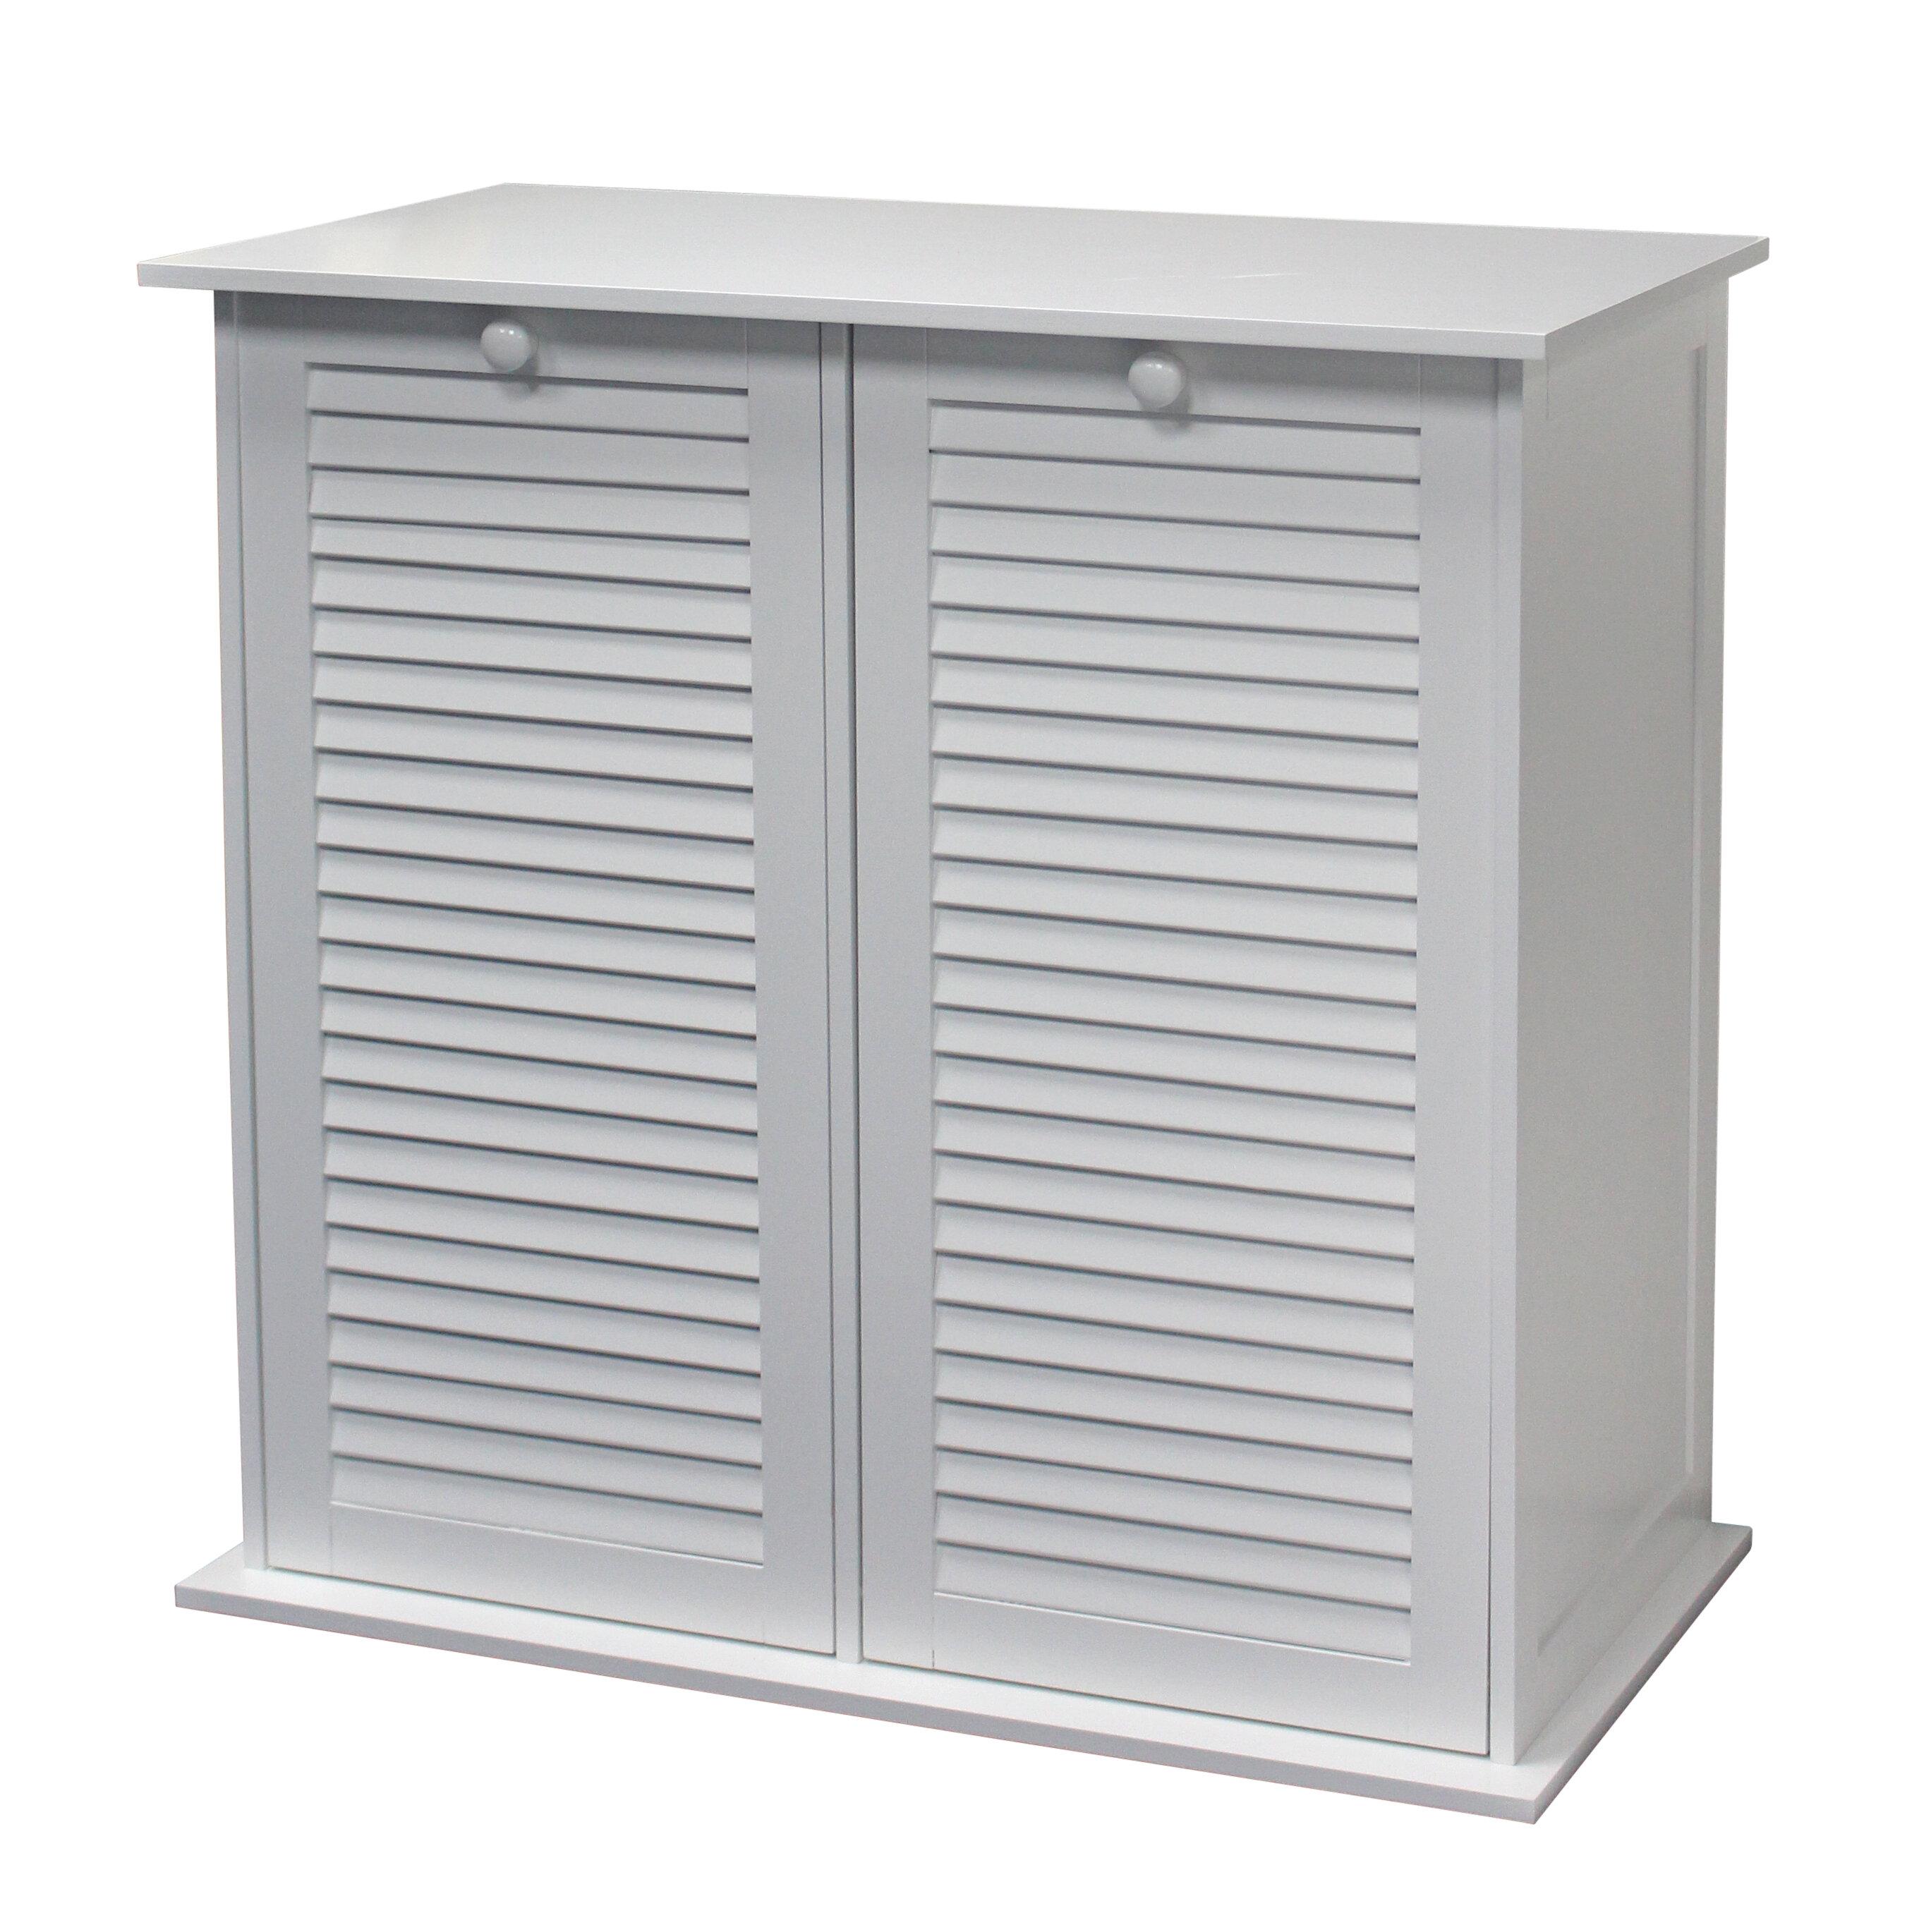 Ehemco Linen Dual Cabinet Laundry